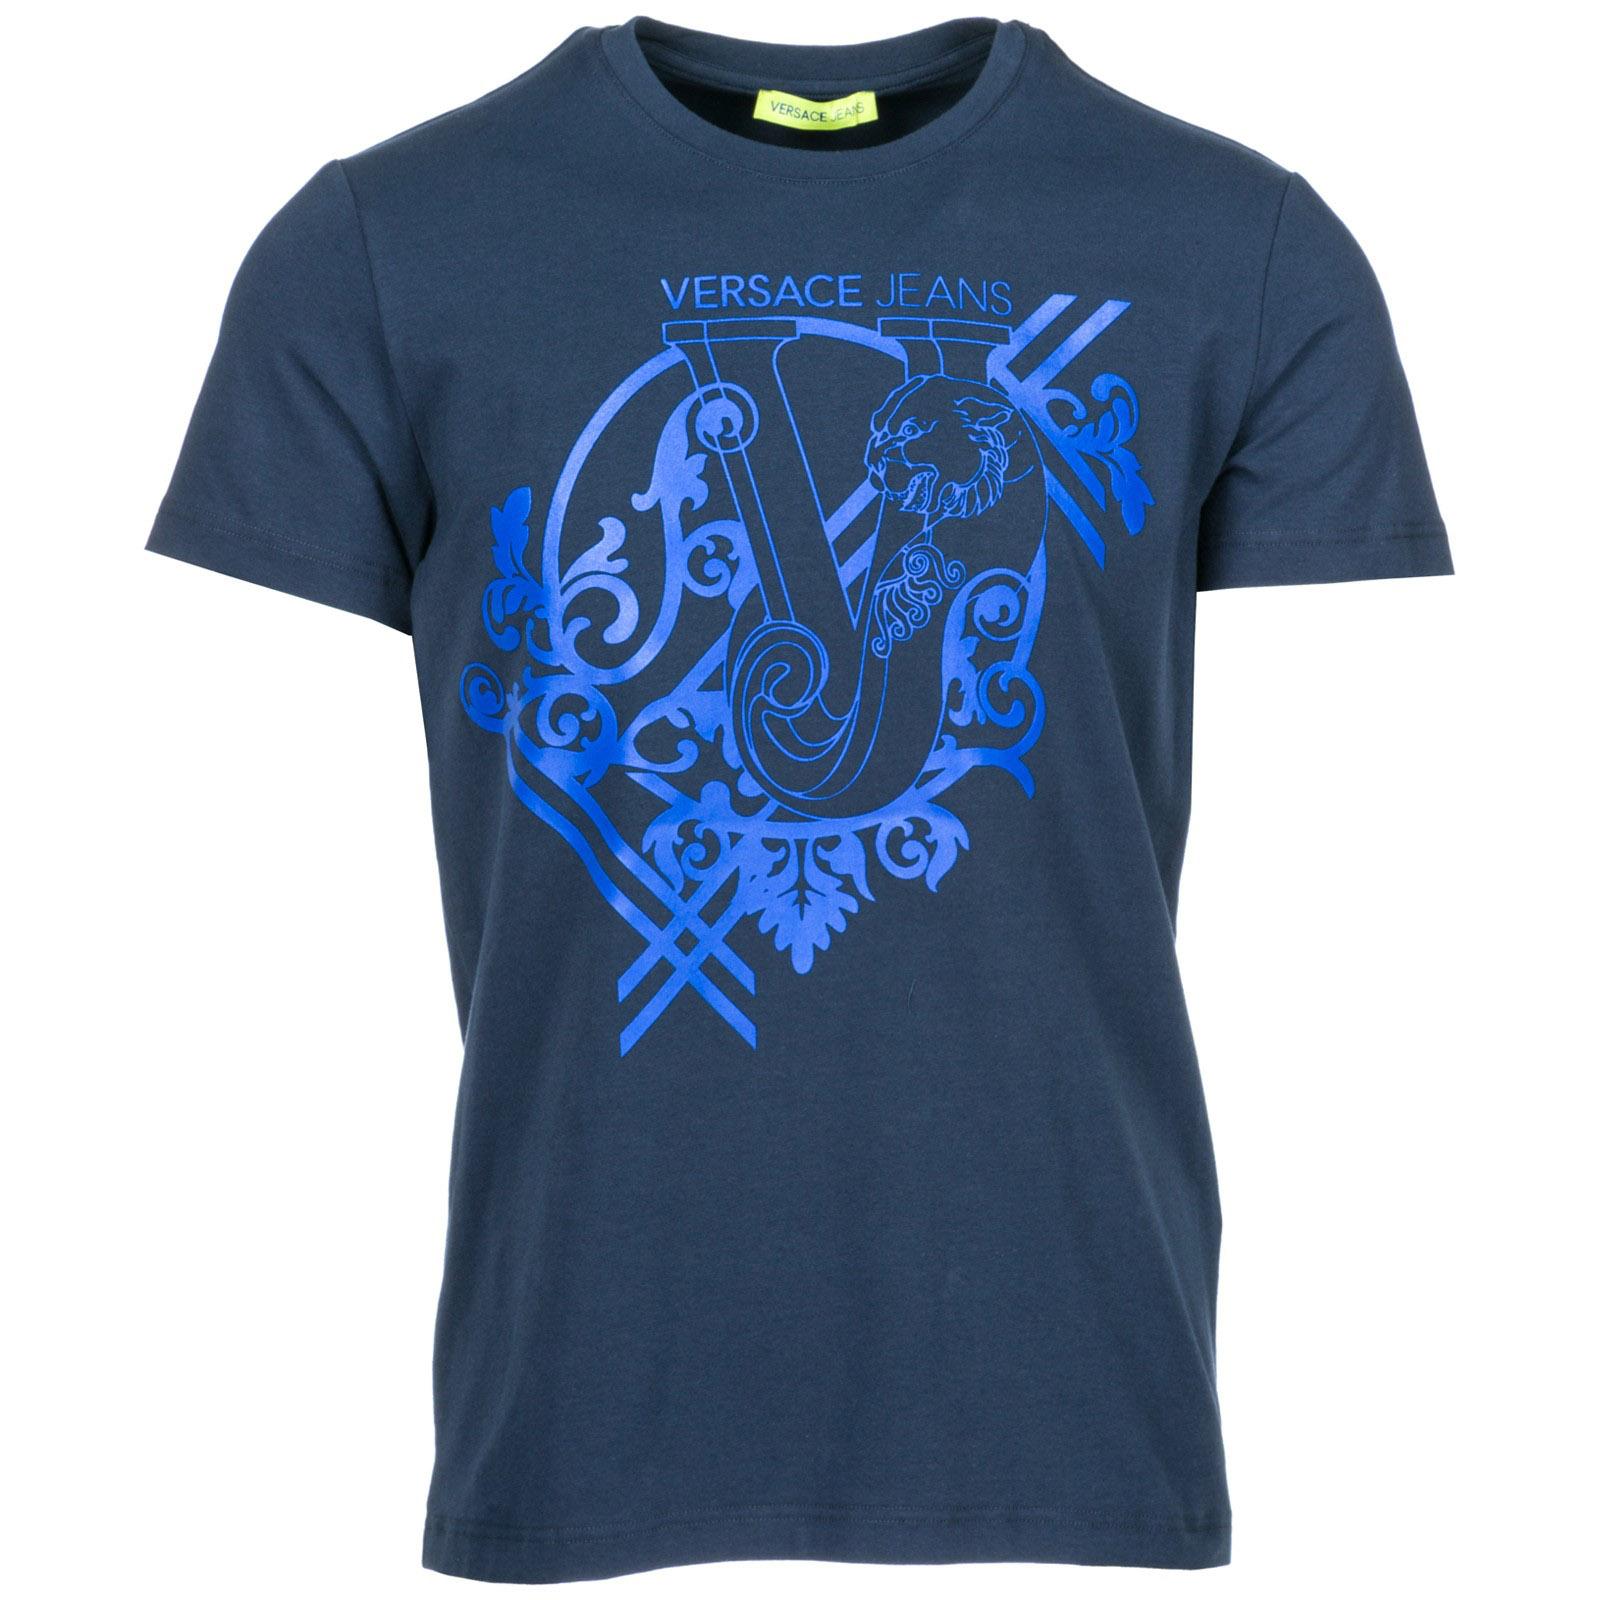 T-shirt Versace Jeans B3GSB74G blu   FRMODA.com ae872cbdff78